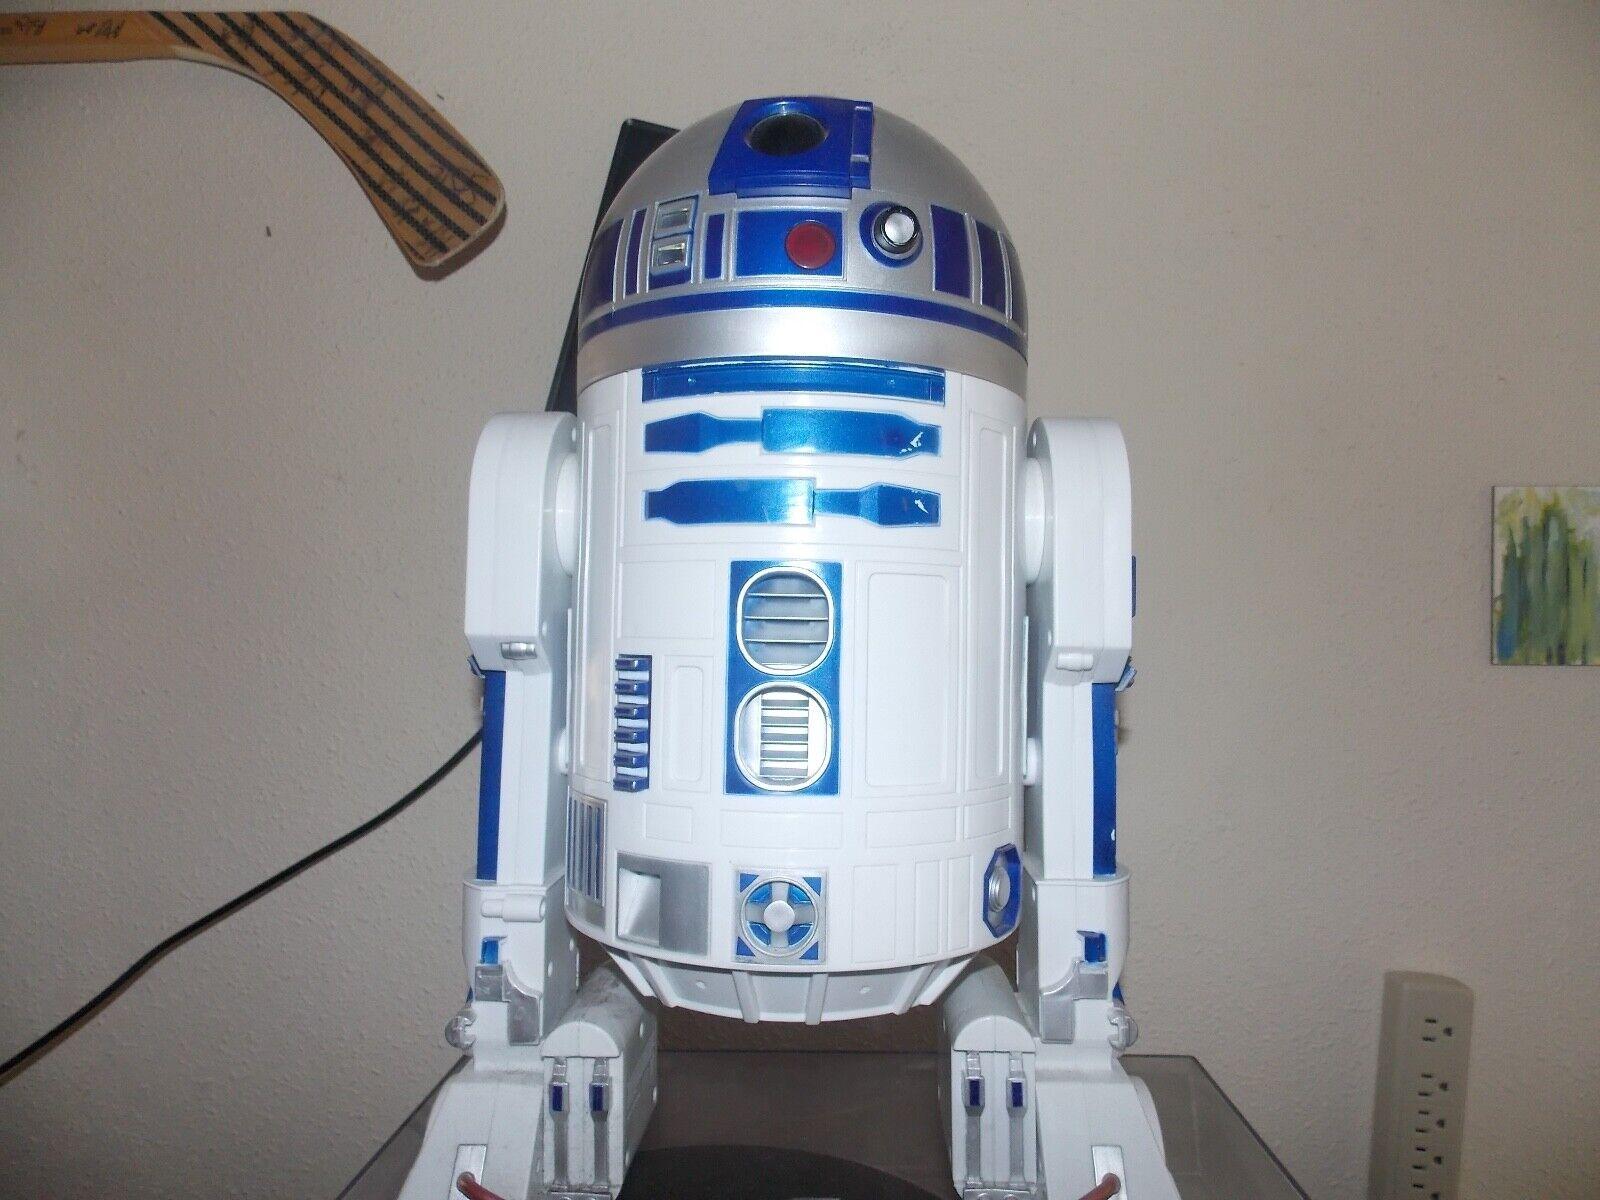 2-Star Wars R2-D2 13 inch Large Electronic Bot + Electronic Yoda